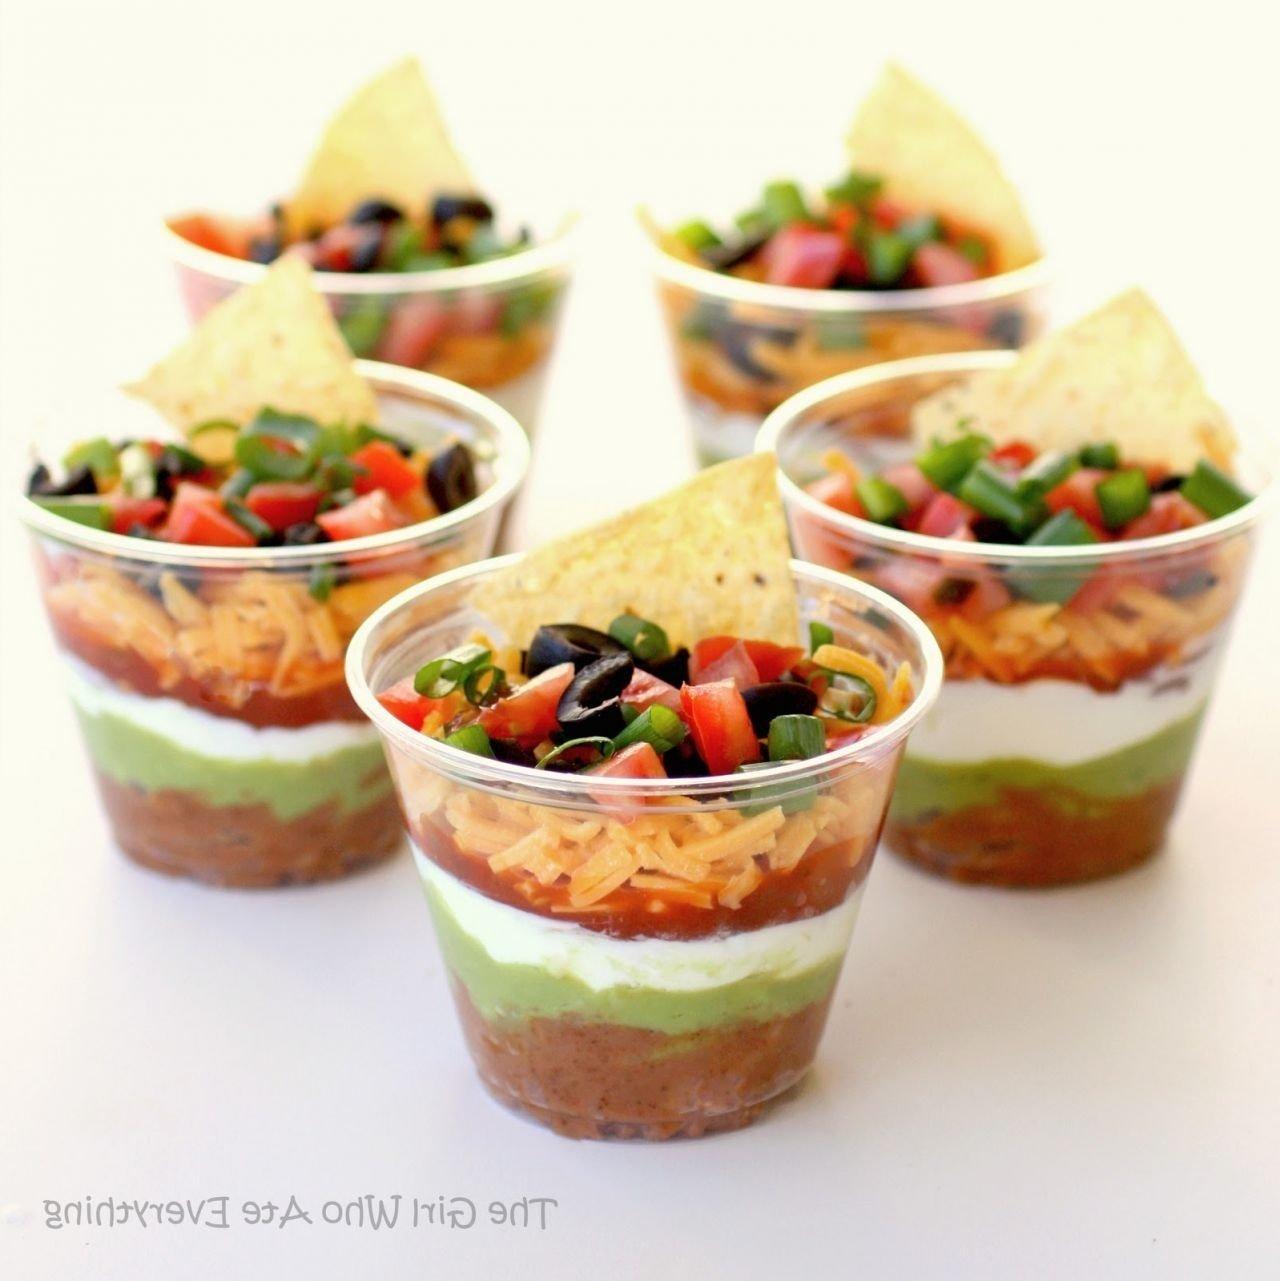 graduation party food ideas | graduation party finger food ideas